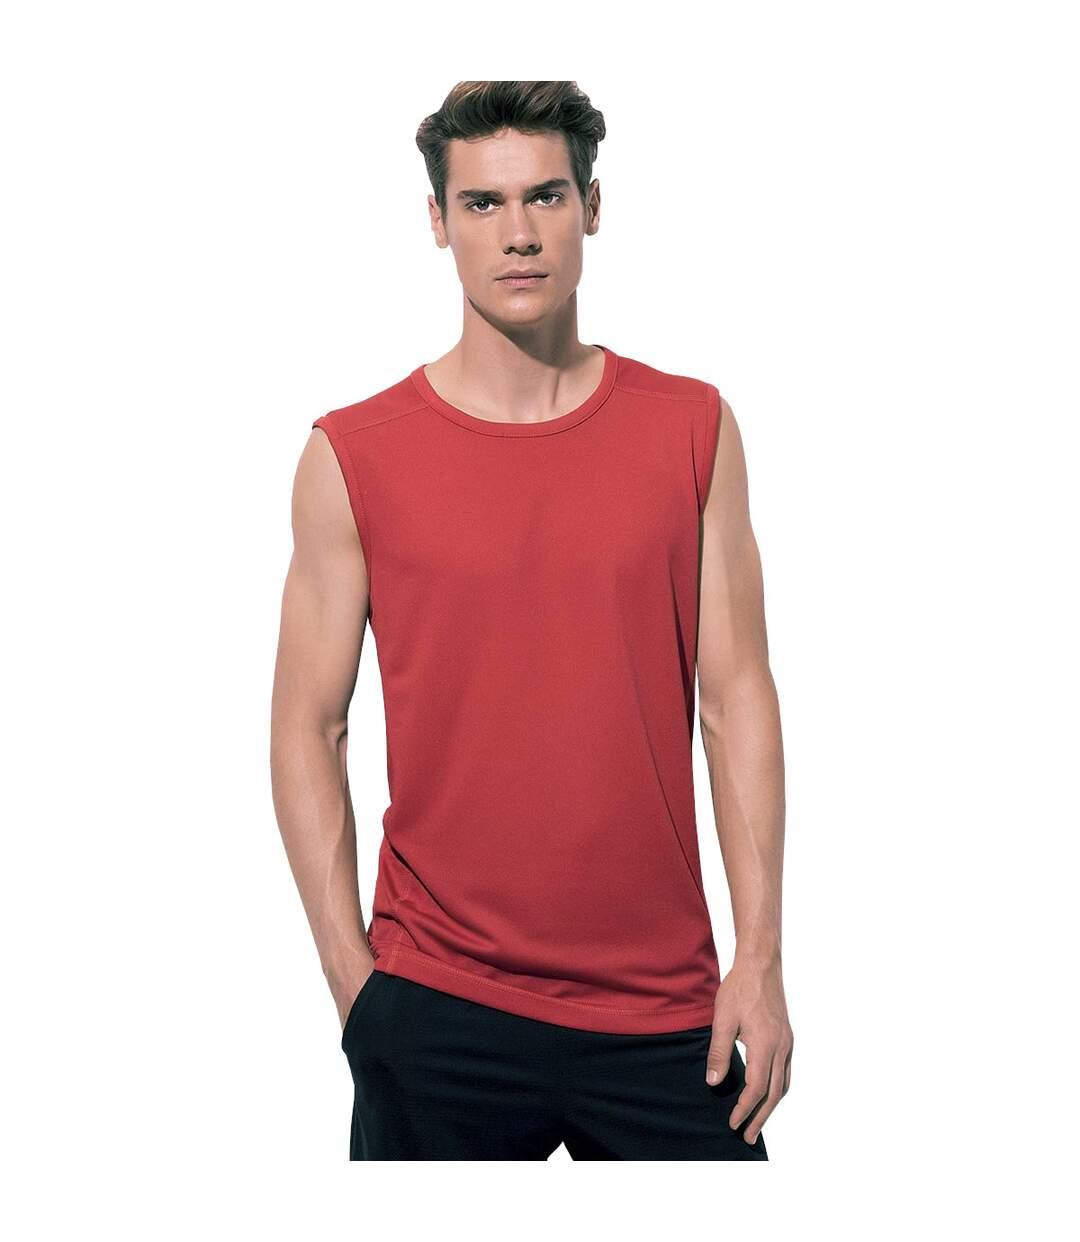 Stedman Mens Active 140 Sleeveless Tee (Crimson Red) - UTAB345